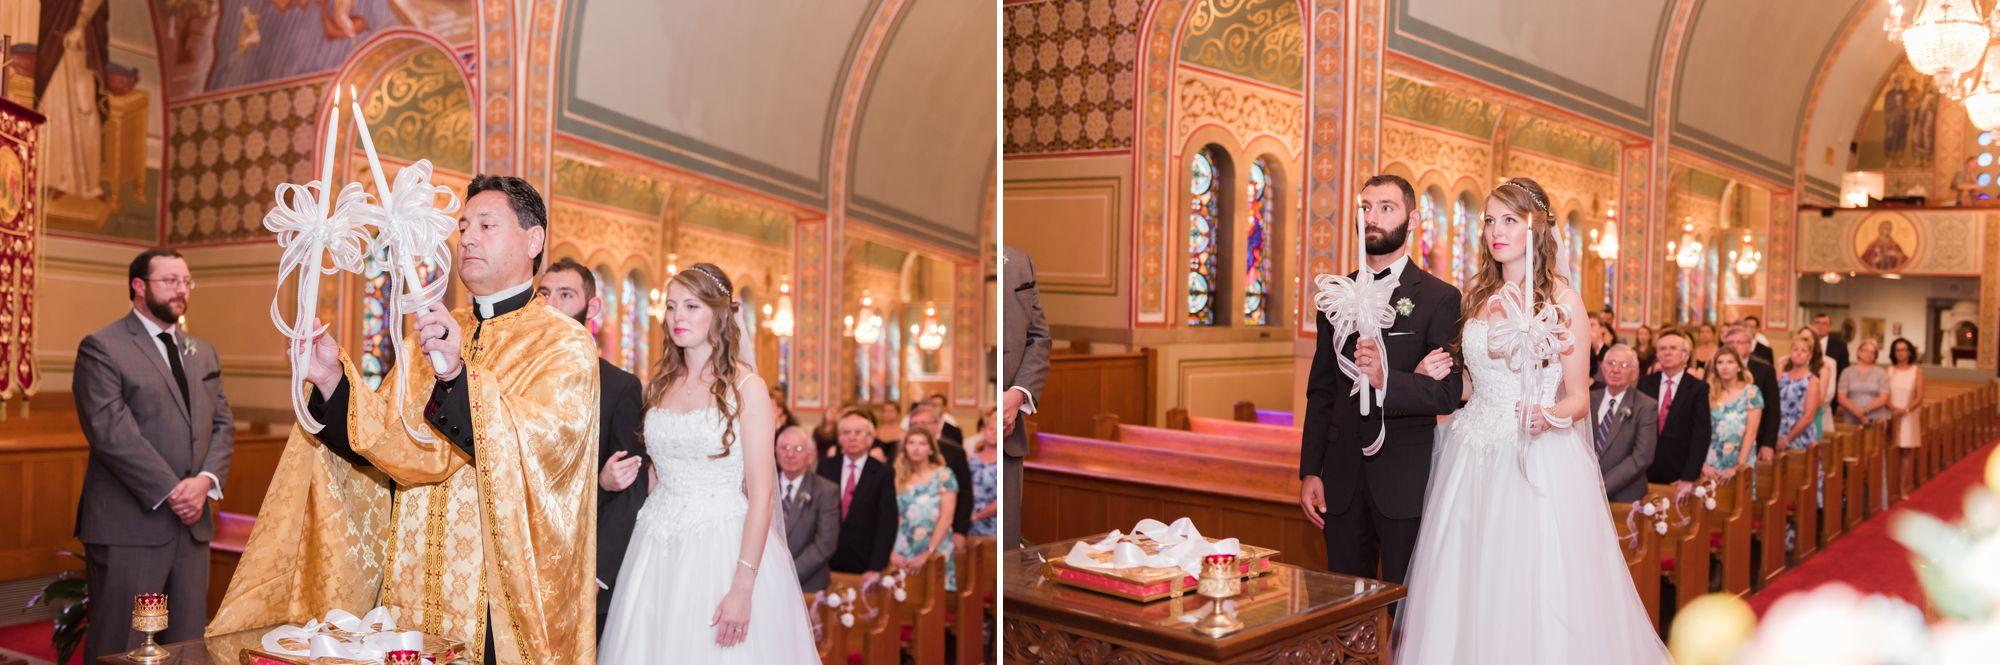 uptown-charlotte-orthodox-greek-wedding 61